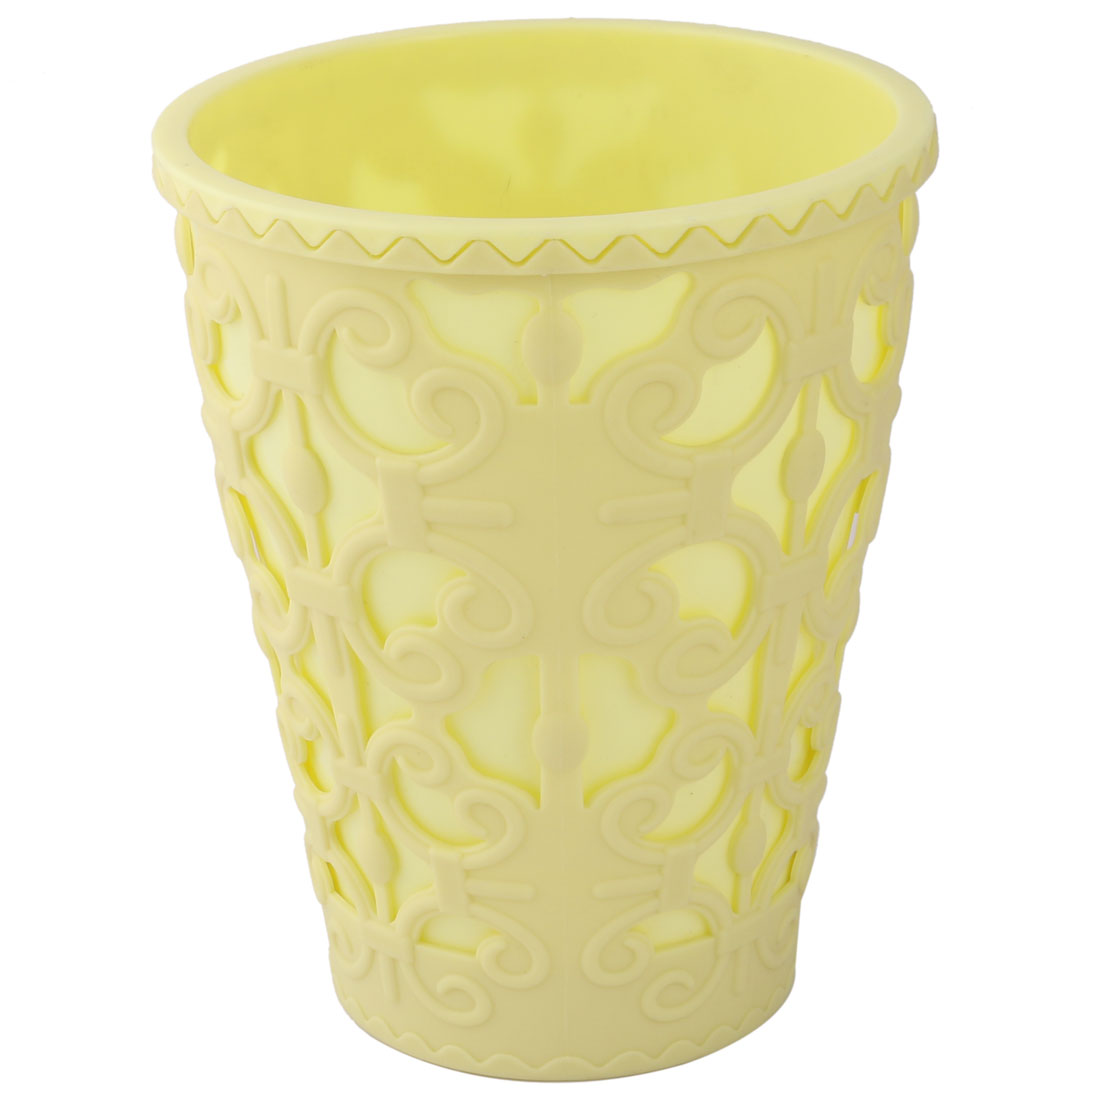 Household Plastic Hollowed Out Design Plant Flower Aloes Cactus Pot Light Yellow 16cm Dia